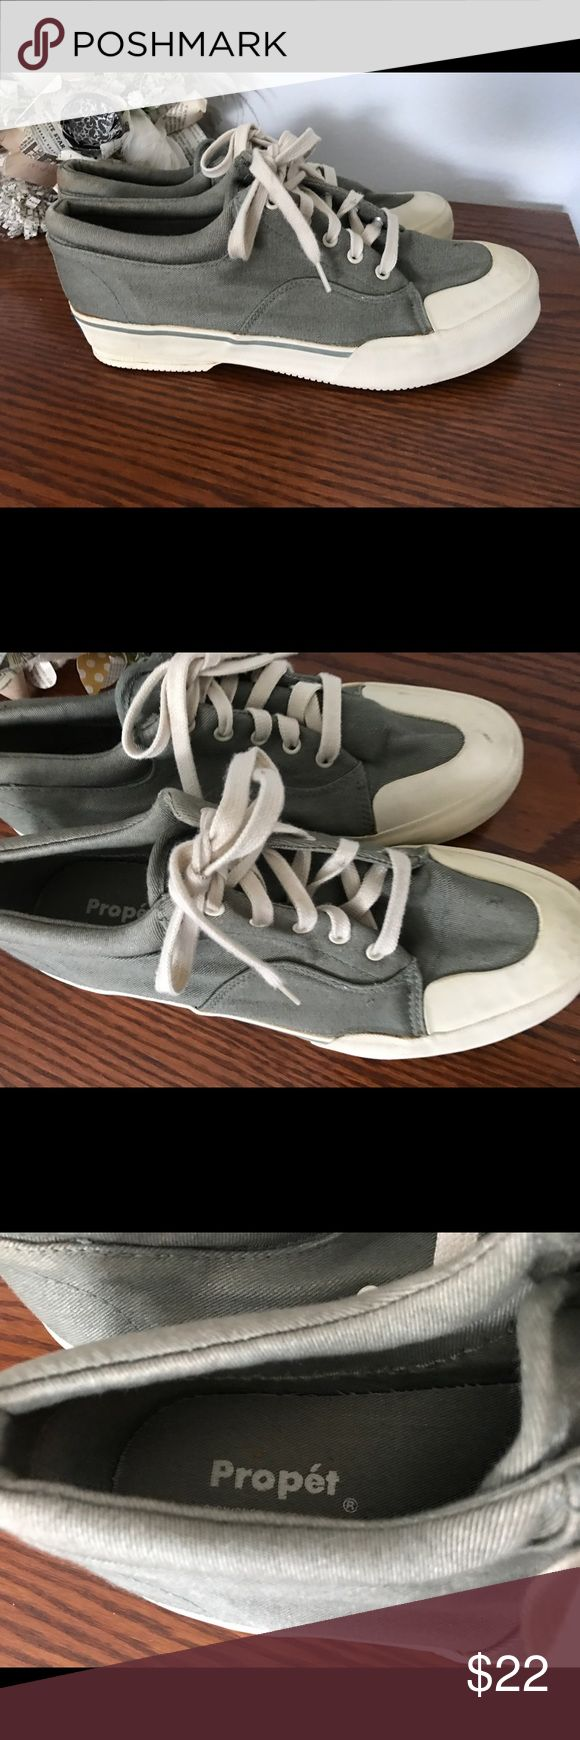 Propet shoes men's 10 GUC. Smoke and pet free home. Bundle discount 20% Propet Shoes